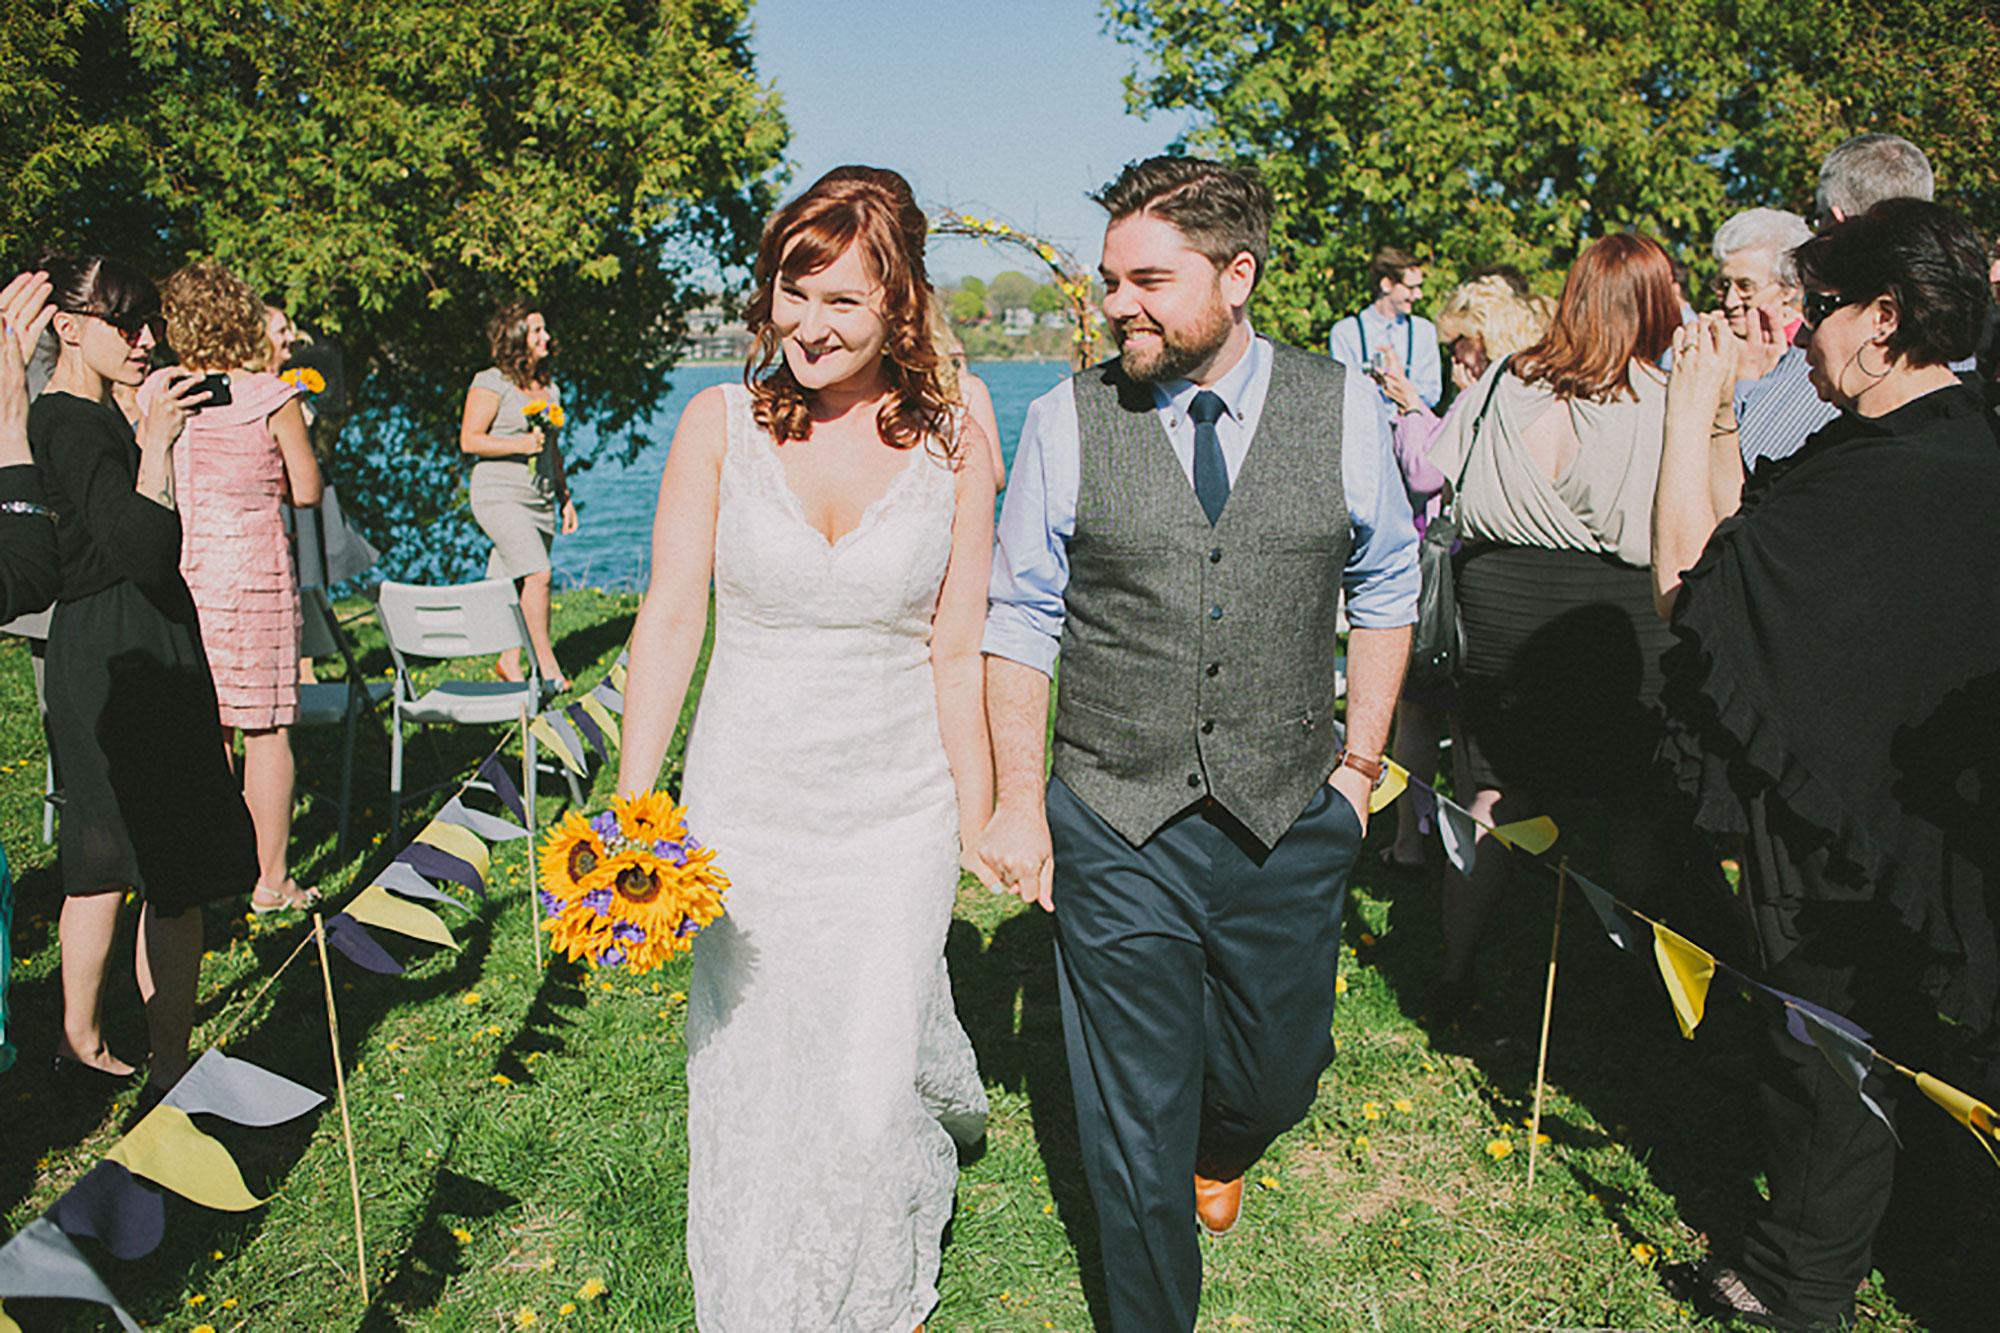 Navy-Hall-Wedding-Vineyard-Bride-Photo-By-Andrew-Mark-Photography-032.jpg